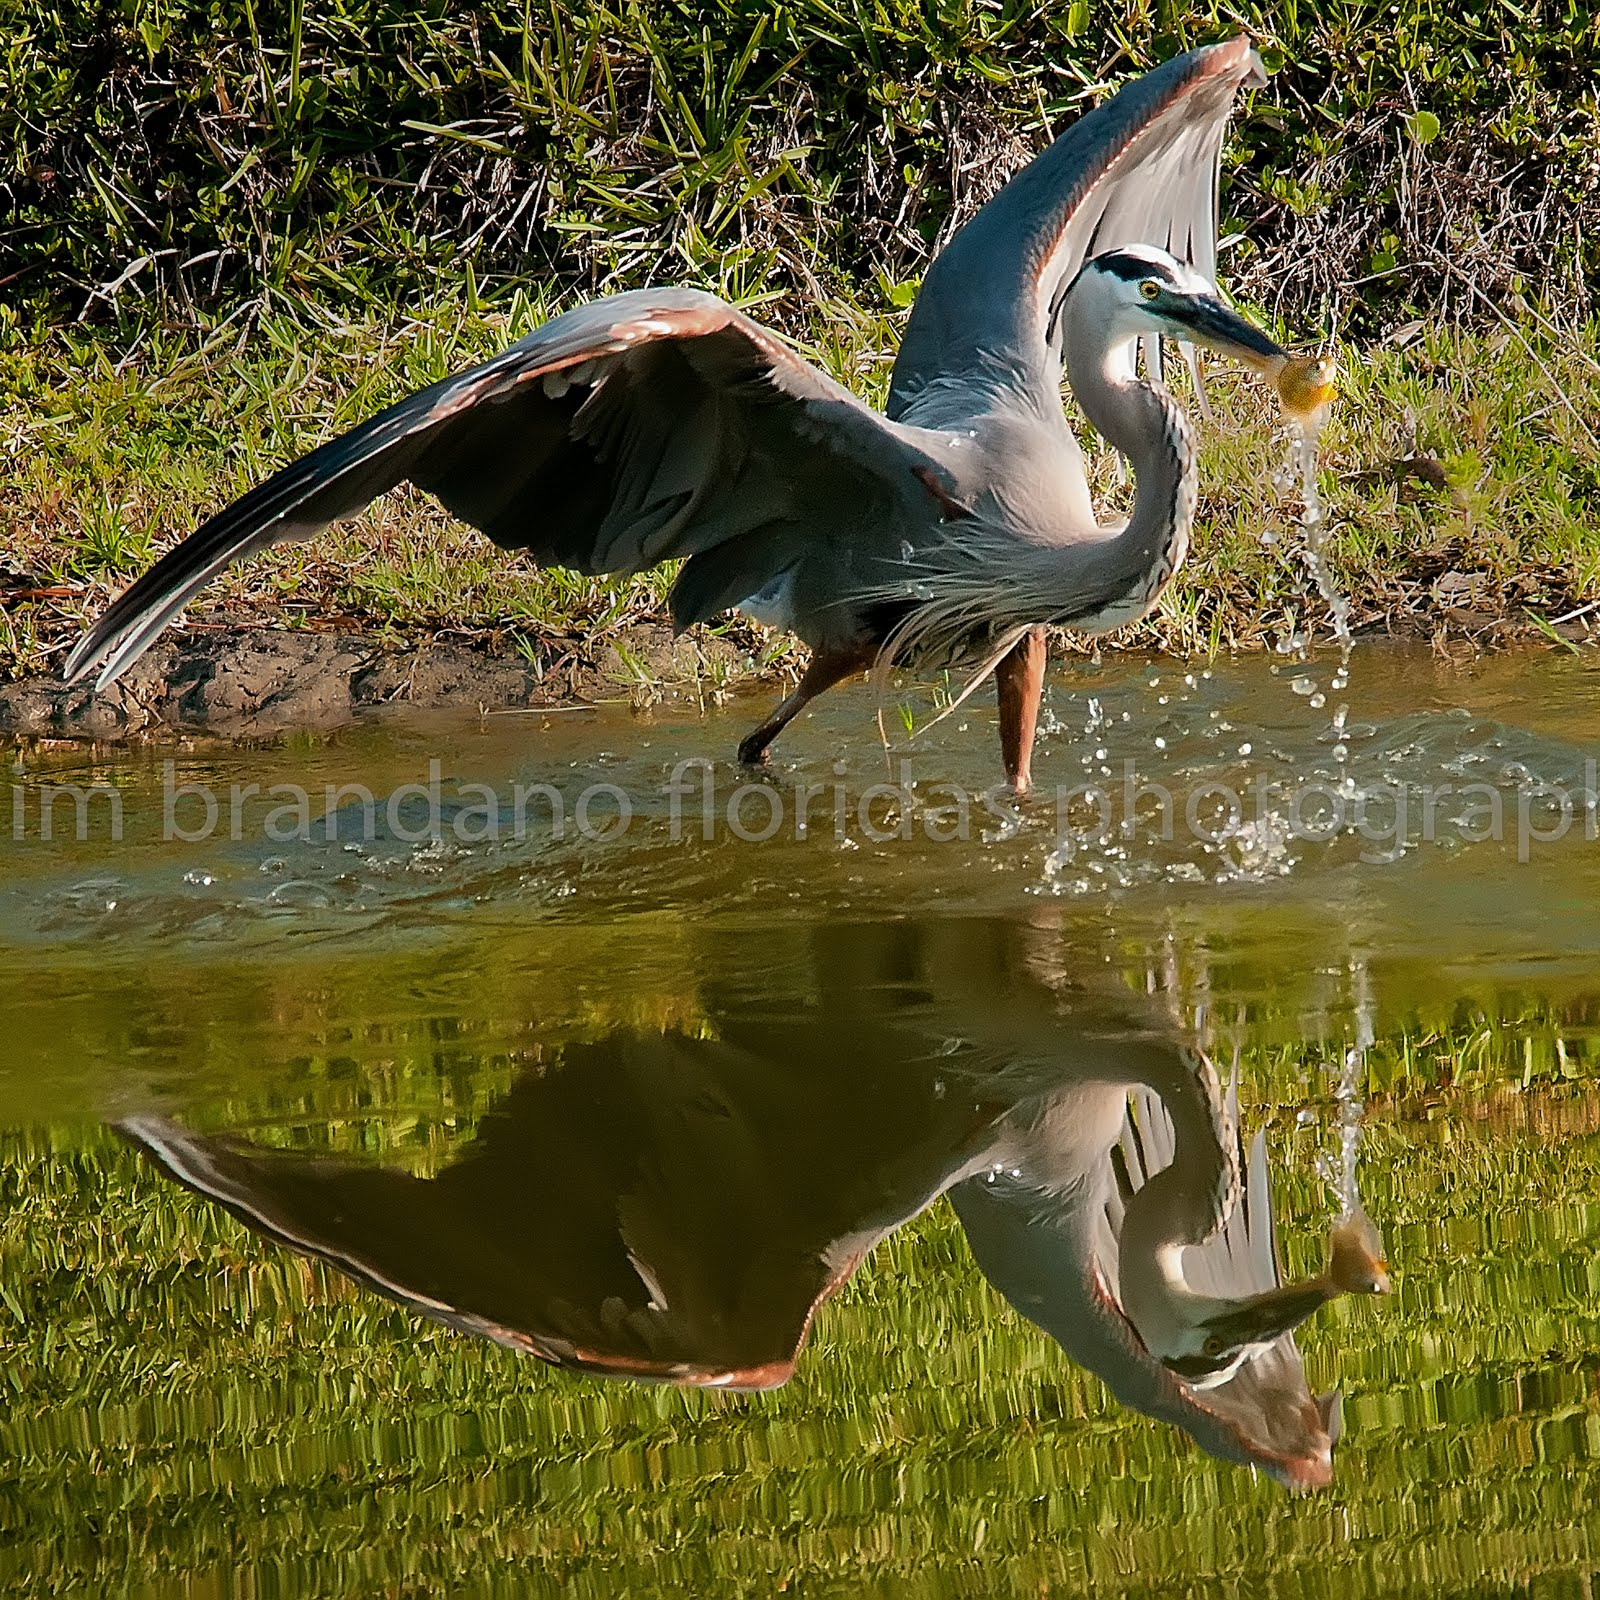 JP BRANDANO: FLORIDAS FINE ART PHOTOGRAPHERS: EVERY